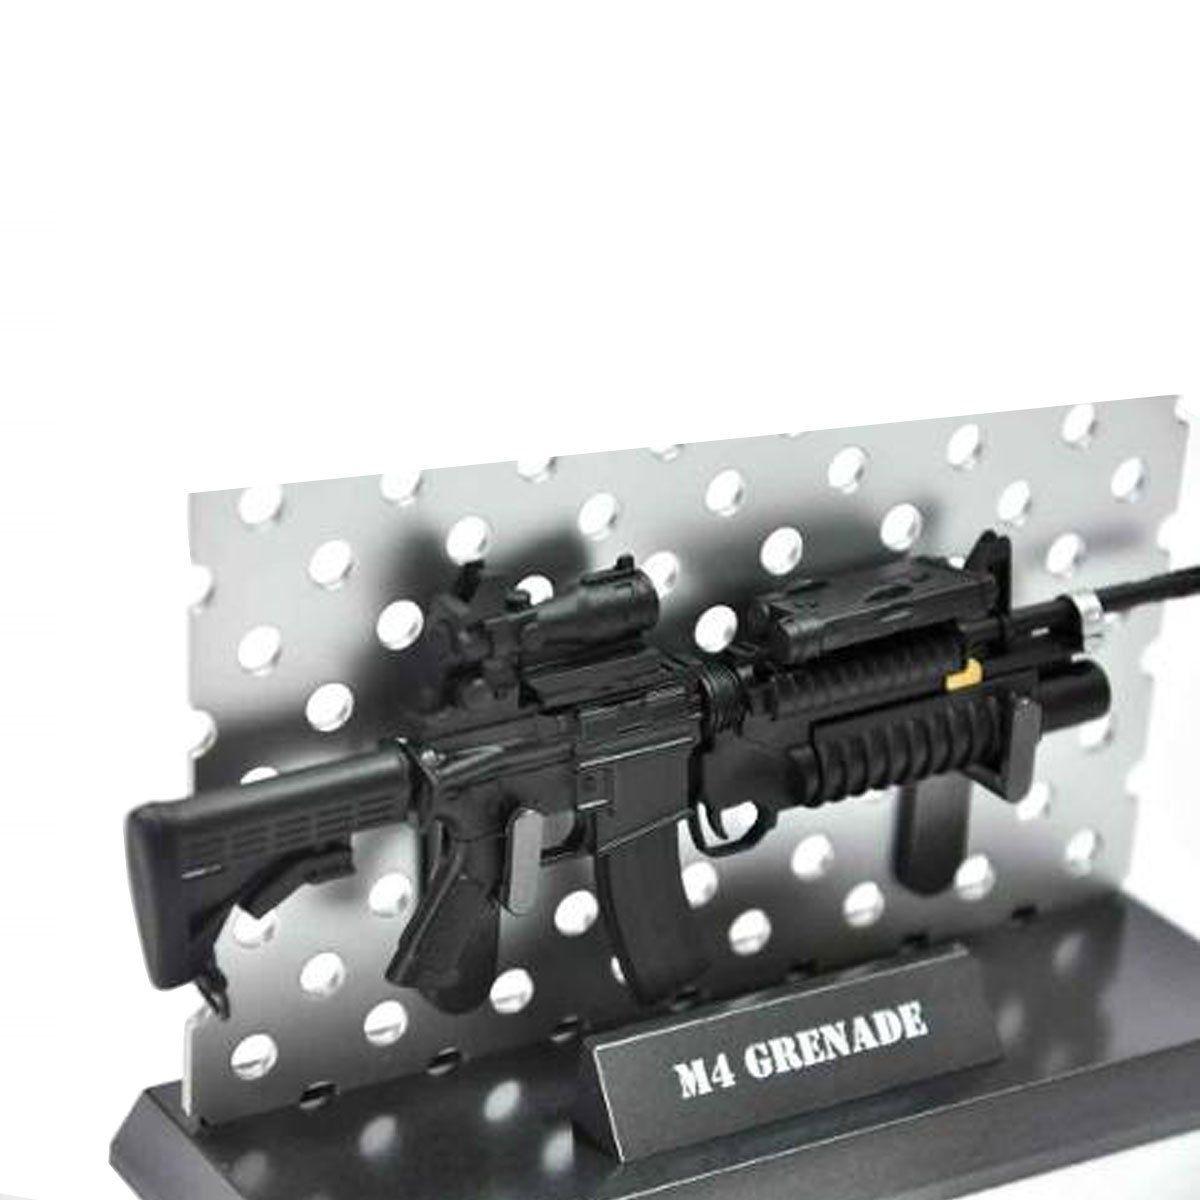 Miniatura de Arma Rifle M4 Grenade Arsenal Guns